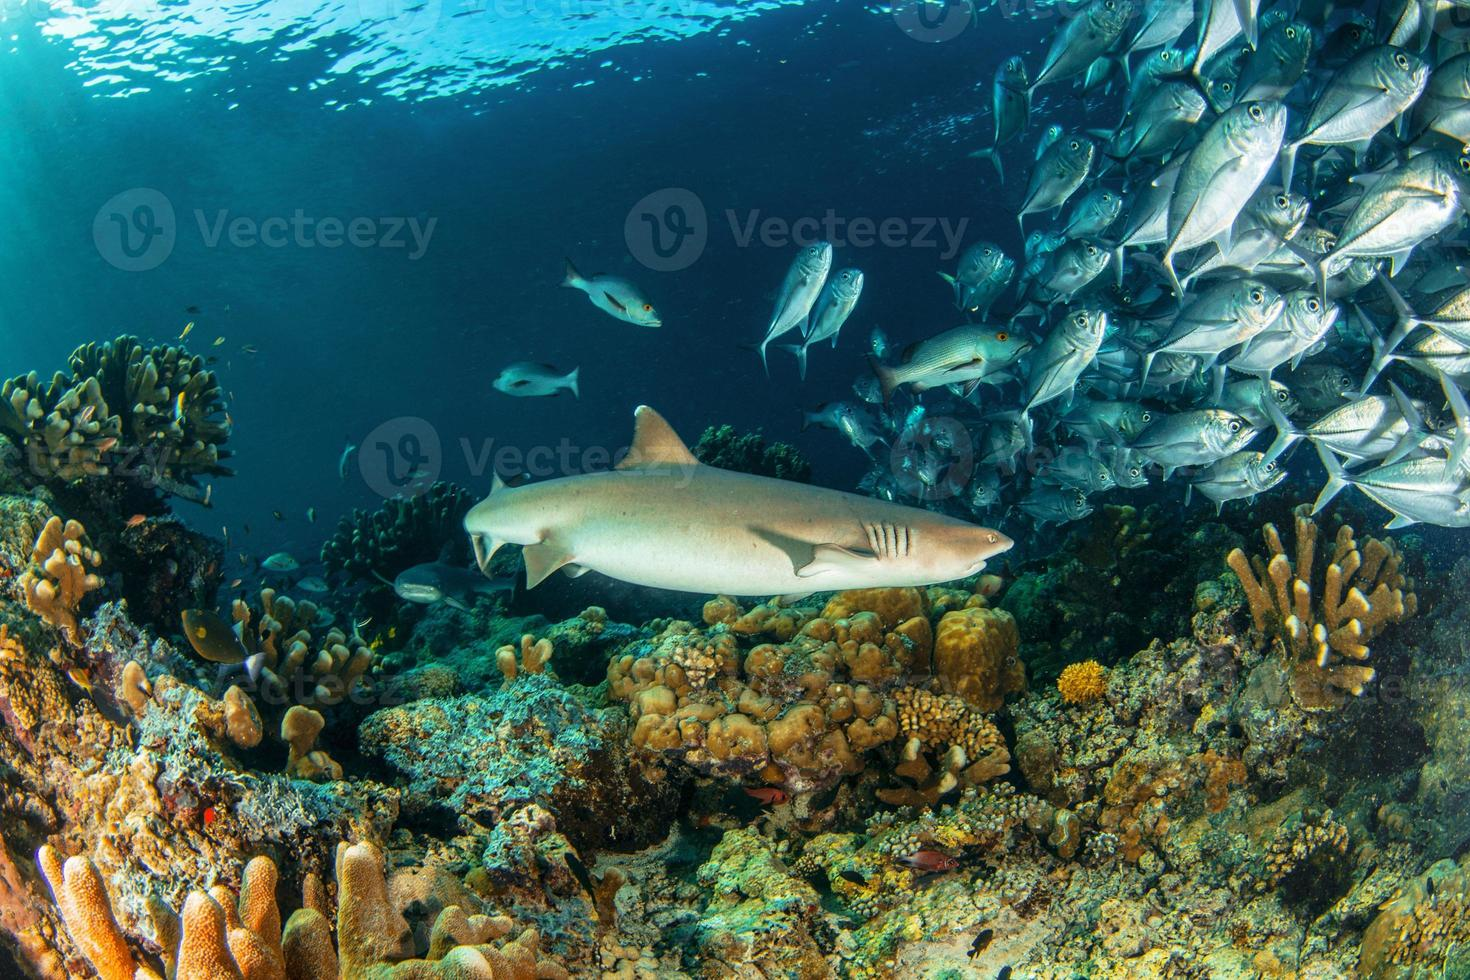 Whitetip shark photo